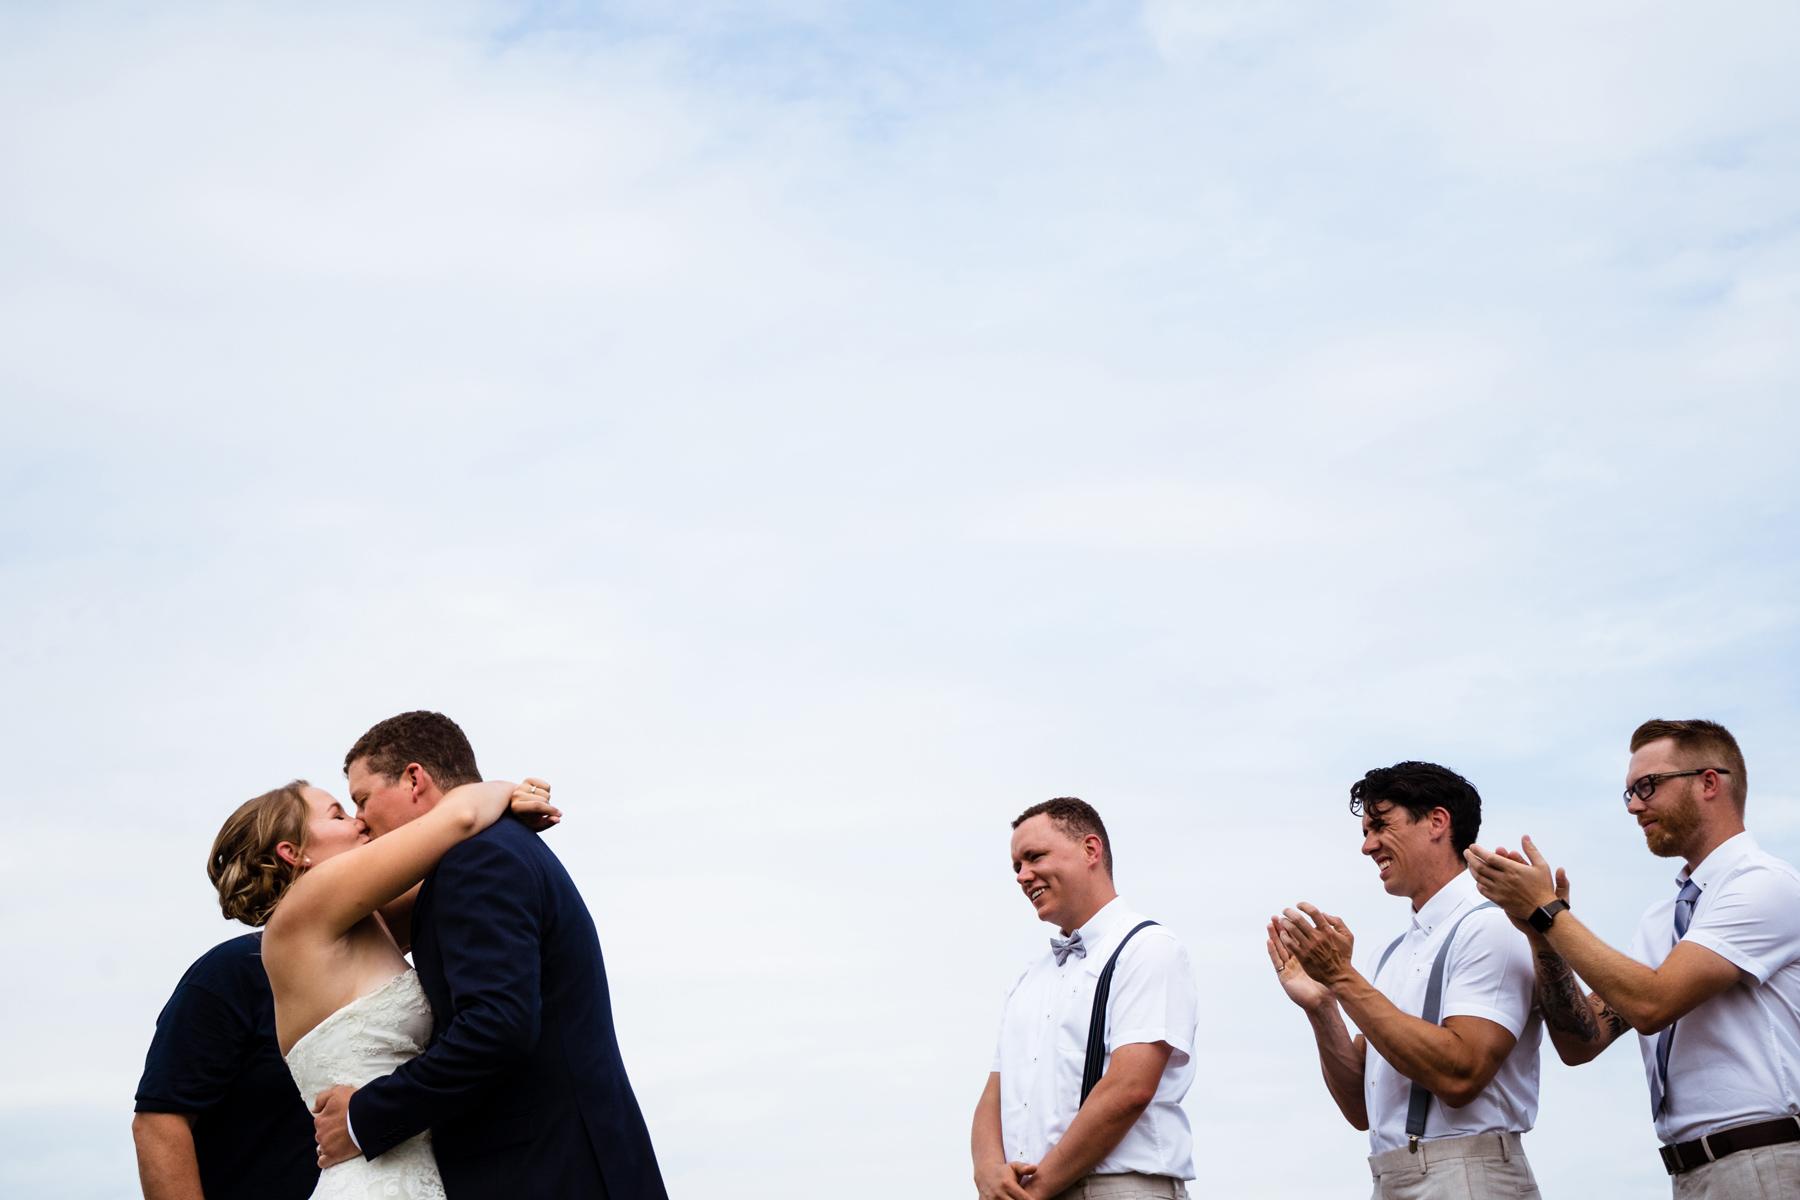 inn-spry-point-wedding-photography-pei-kandisebrown-jm2018-24